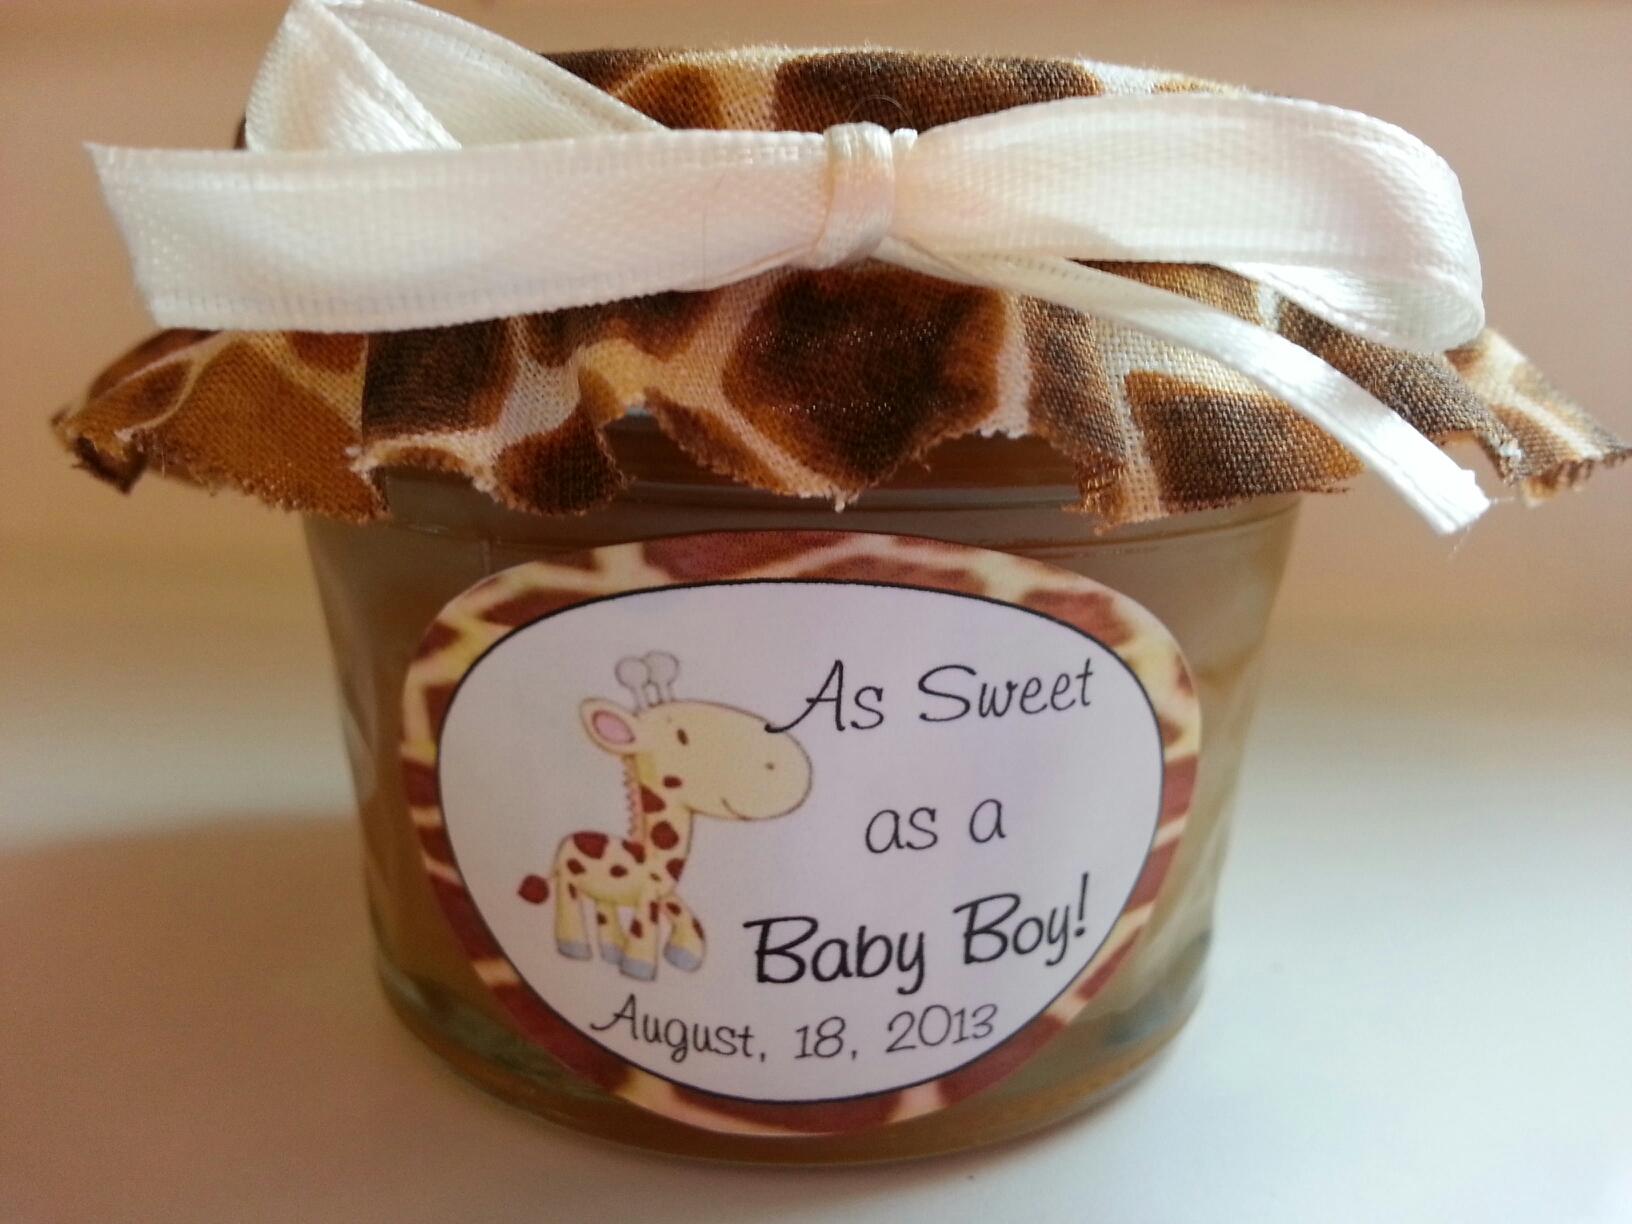 Giraffe As Sweet as a Baby Boy.jpeg